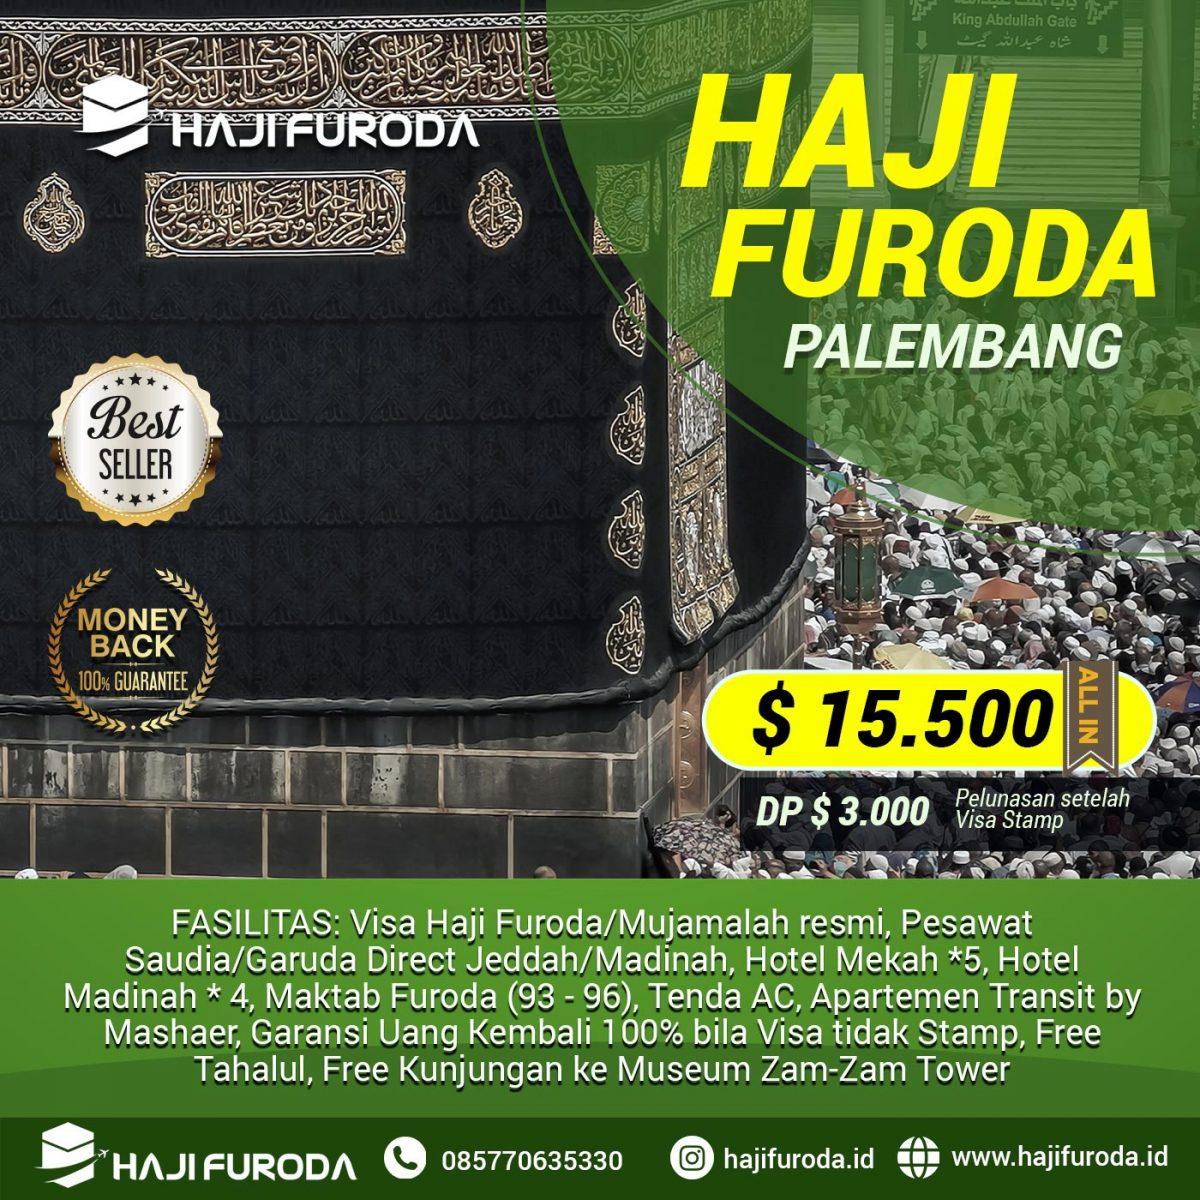 Haji Furoda Palembang